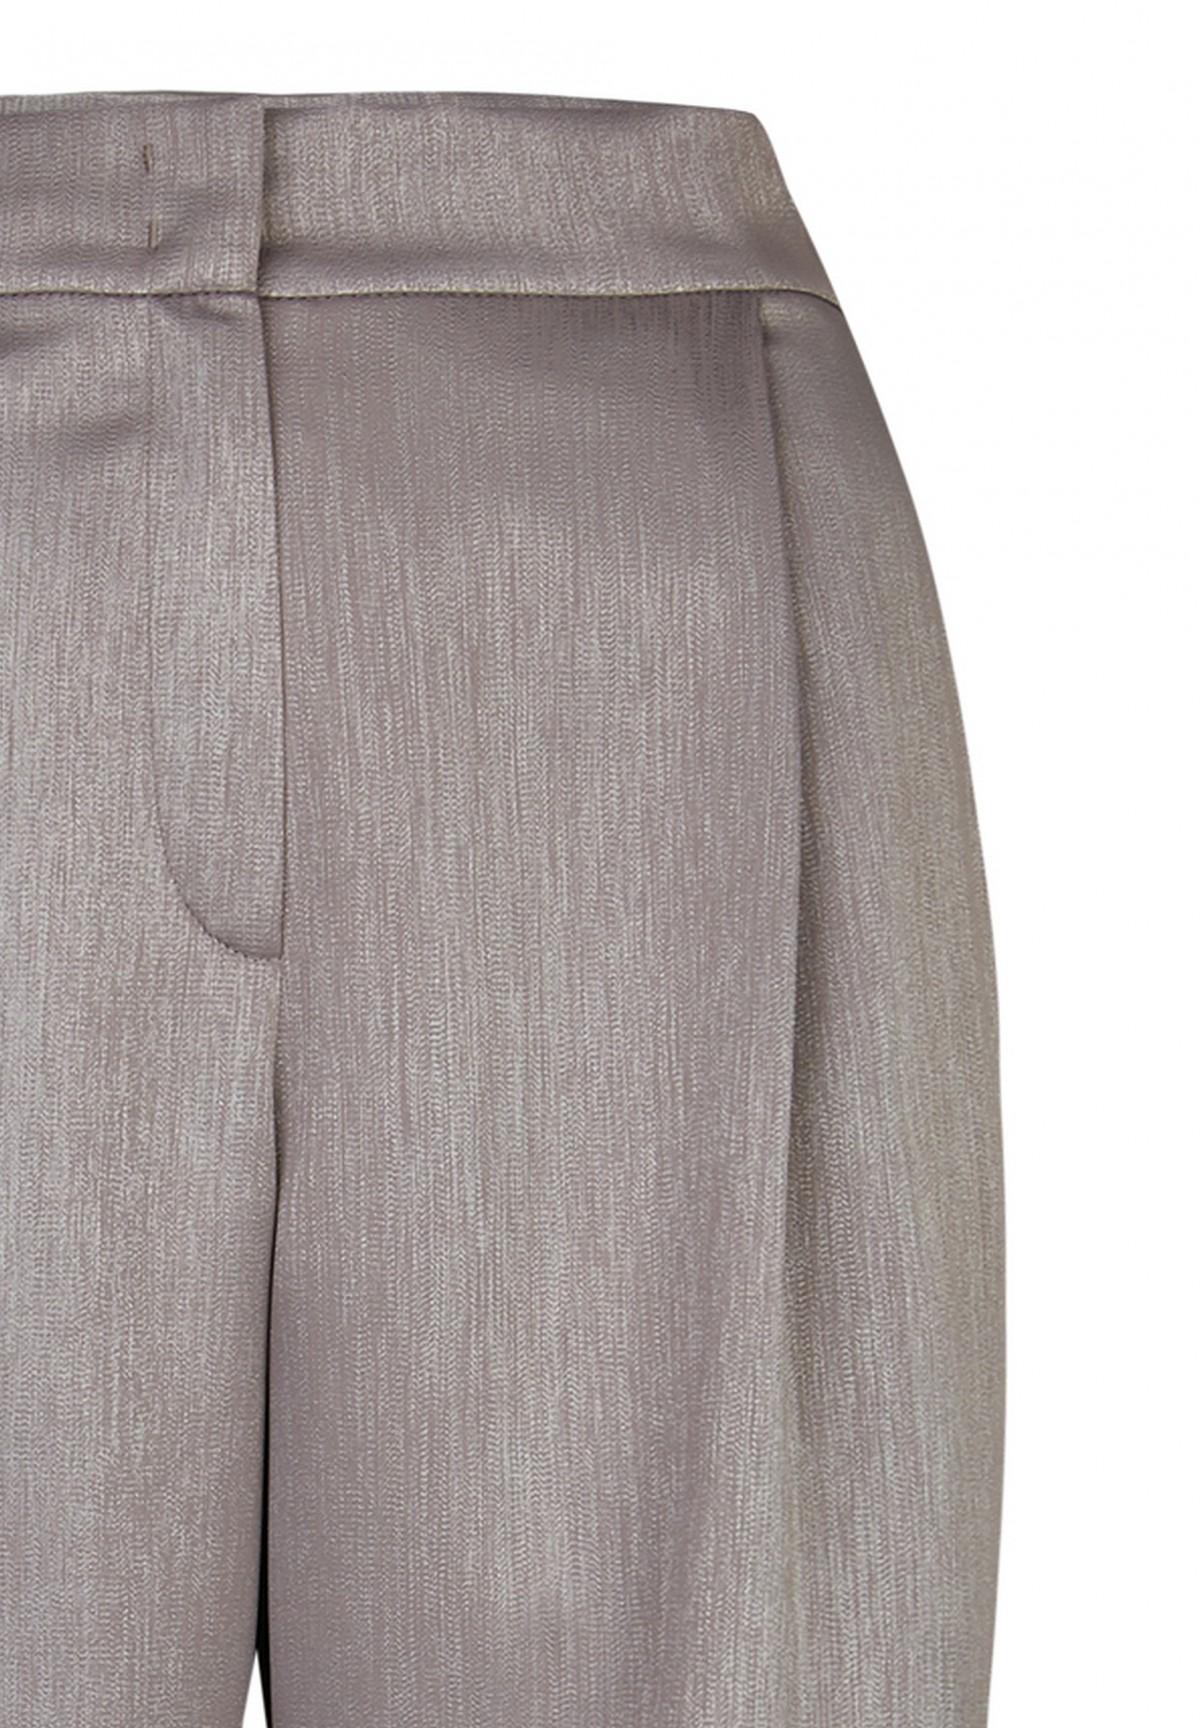 Jupe culotte taille haute /